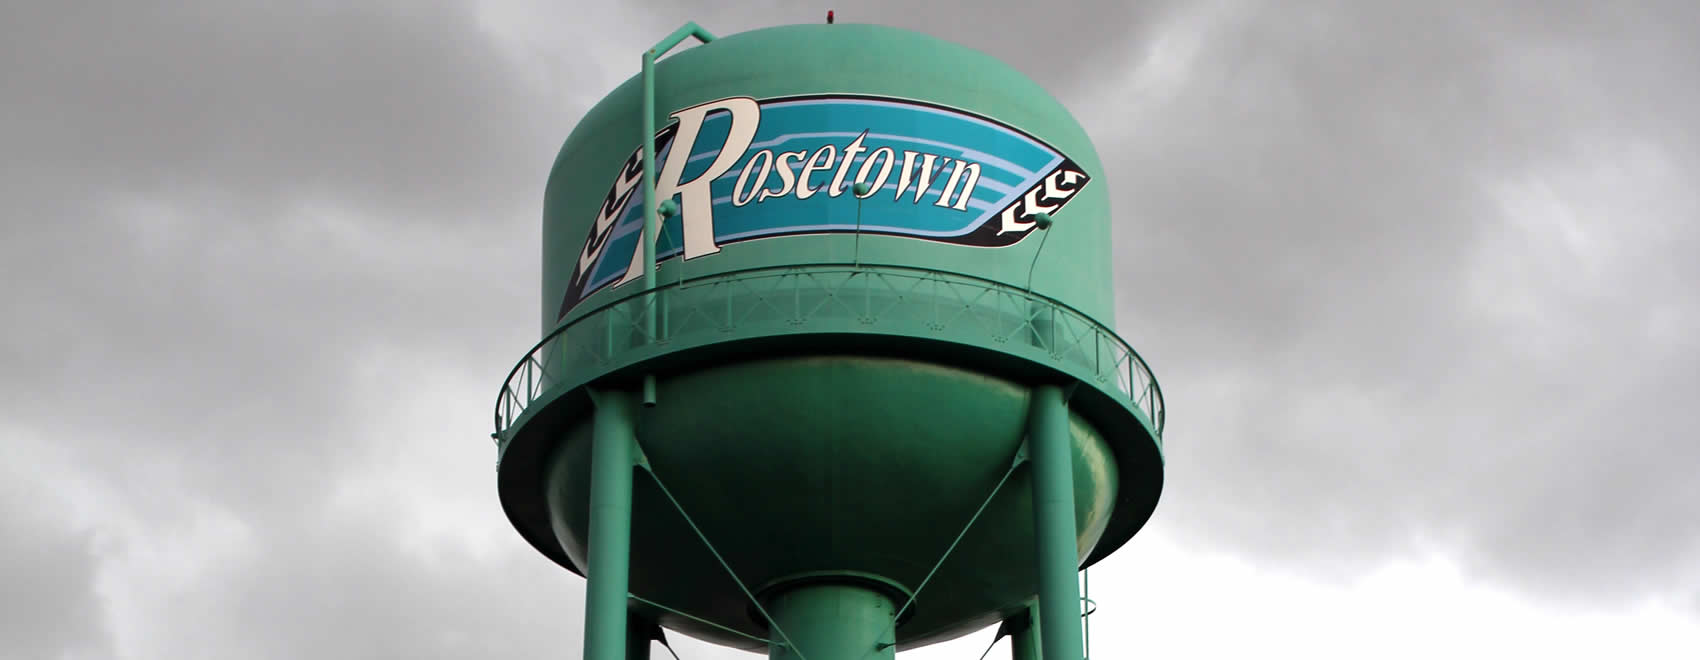 Town of Rosetown Water Tower